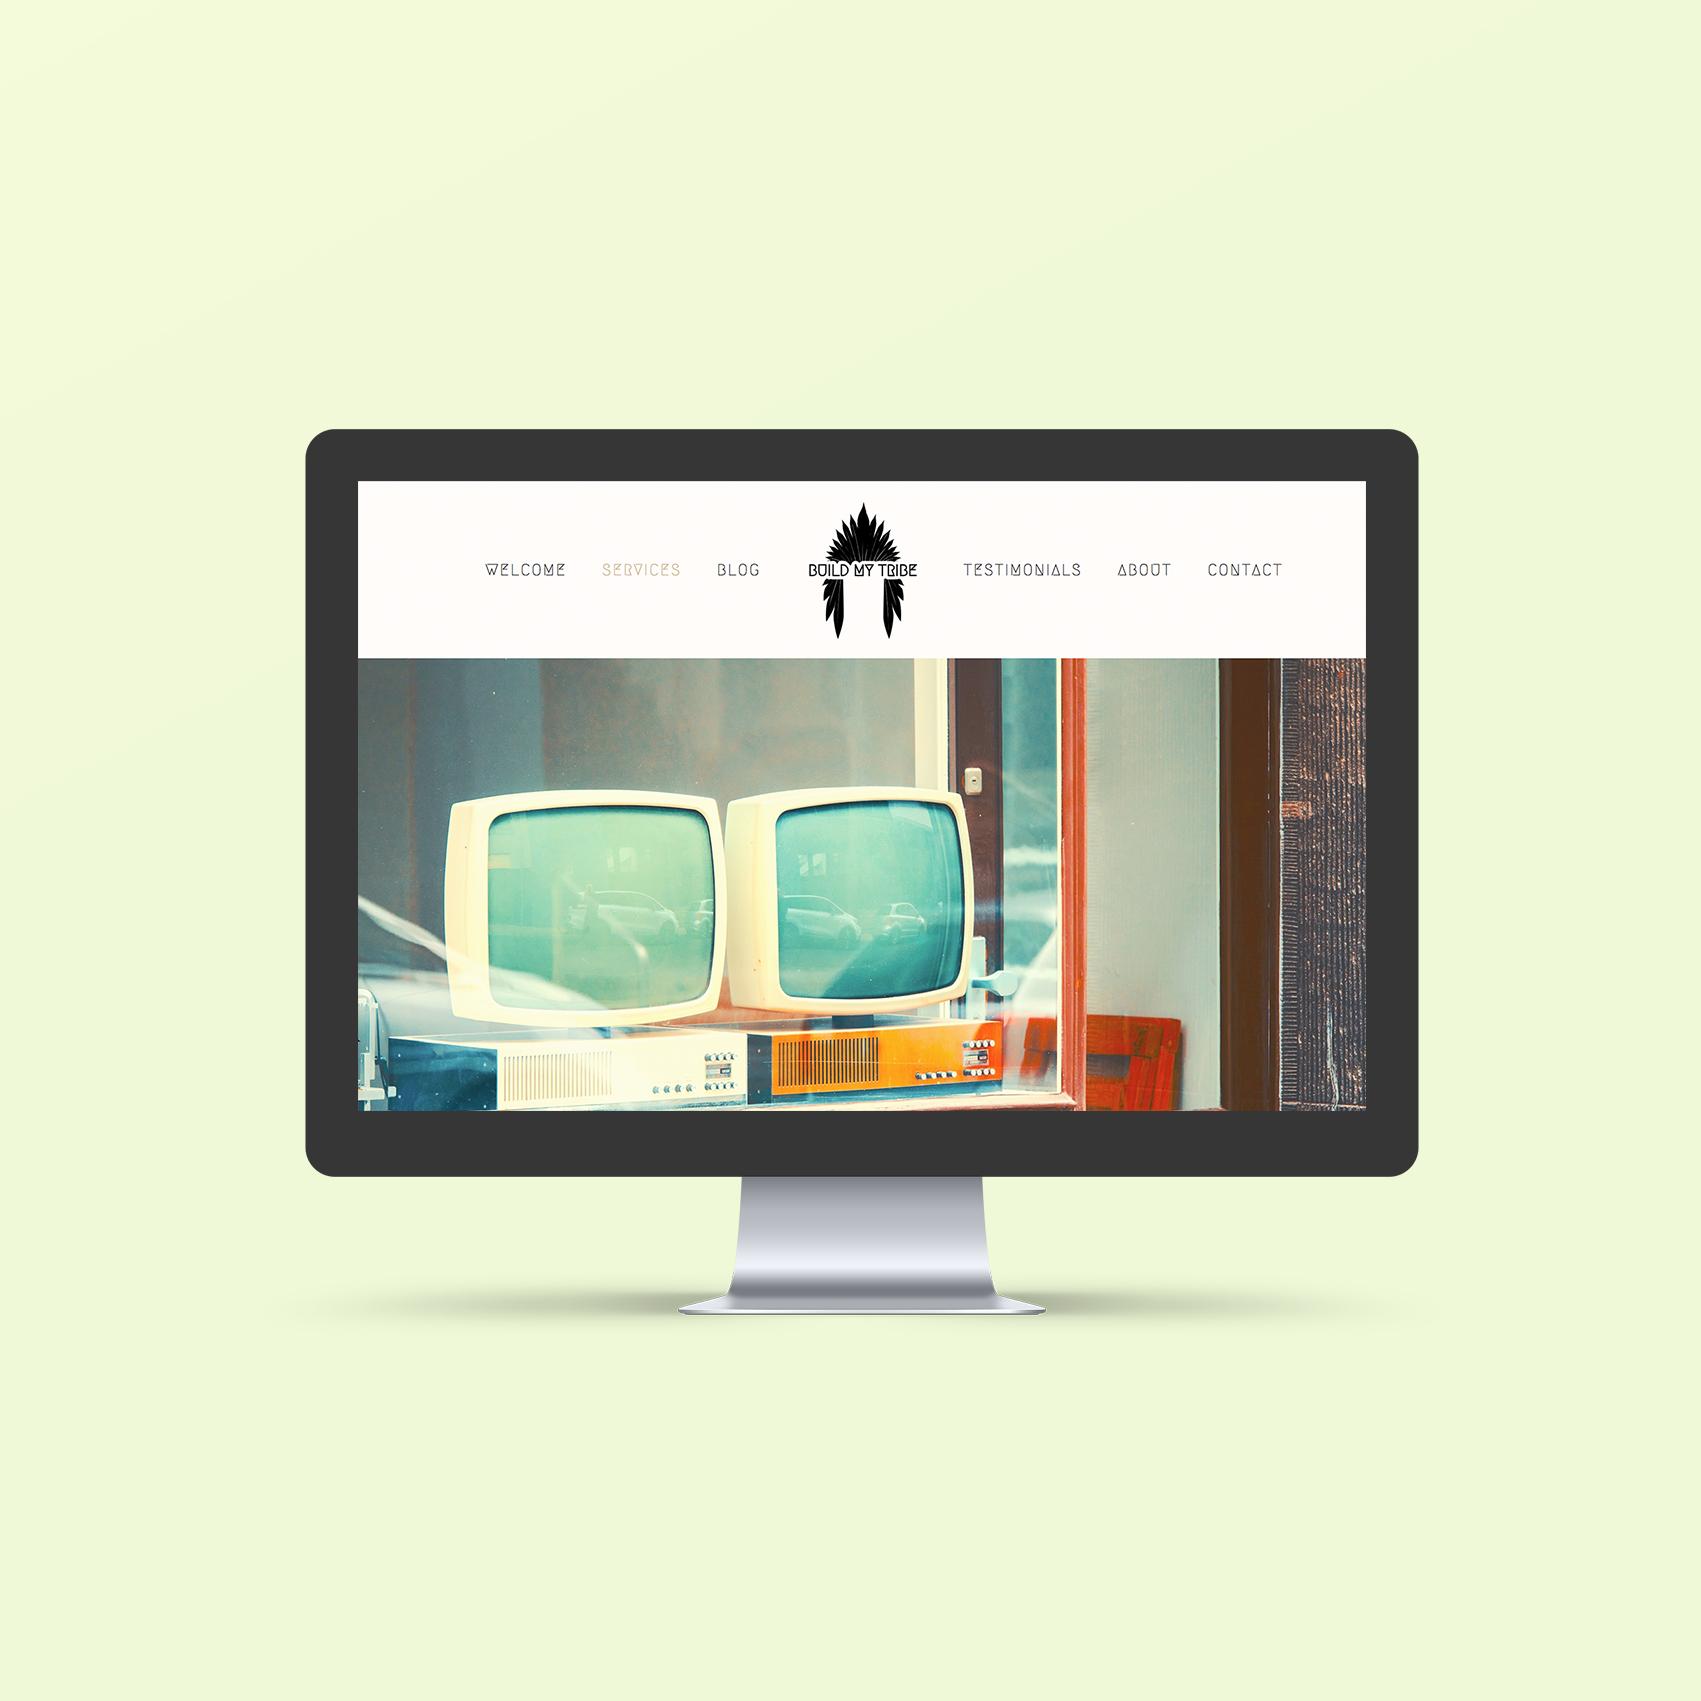 Squarespace SEO Services